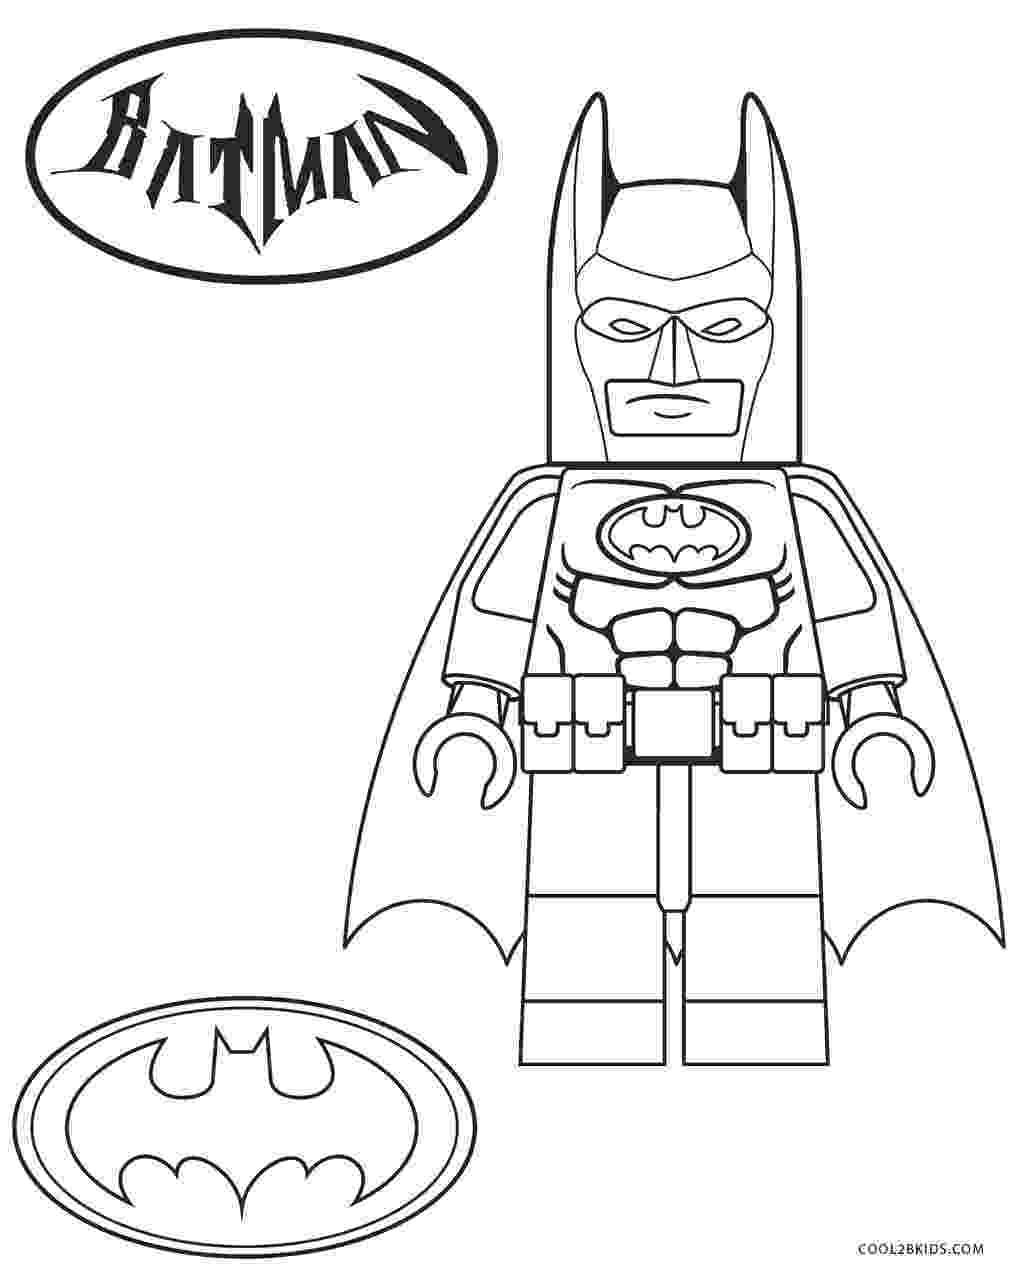 lego coloring sheets free lego ninjago coloring pages best coloring pages for kids free sheets lego coloring